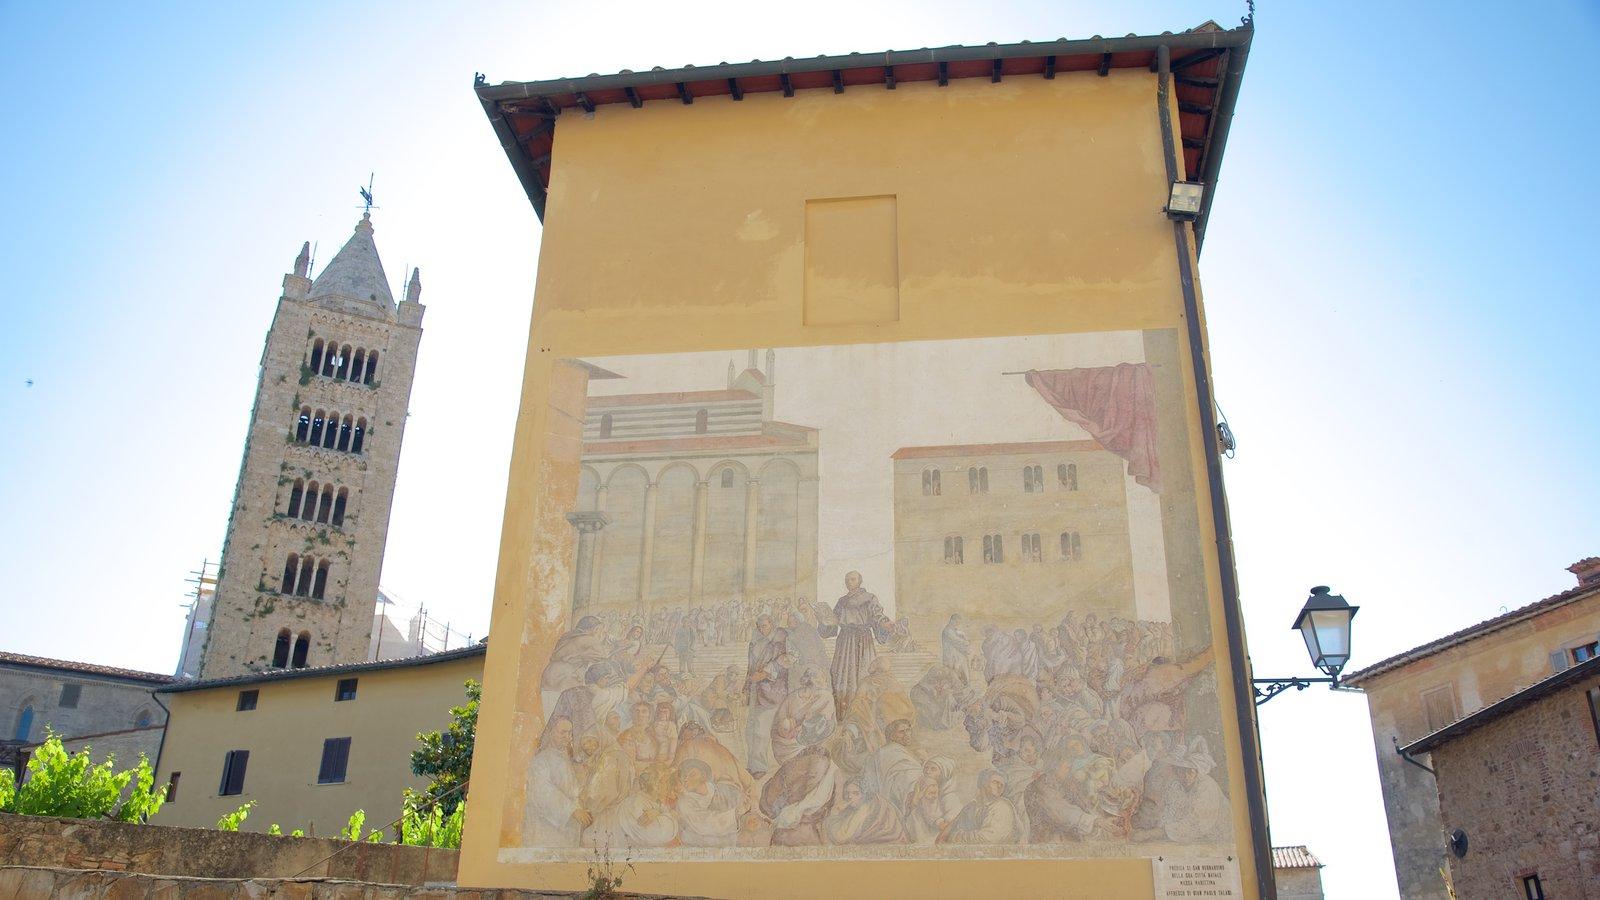 Massa Marittima showing outdoor art and heritage architecture